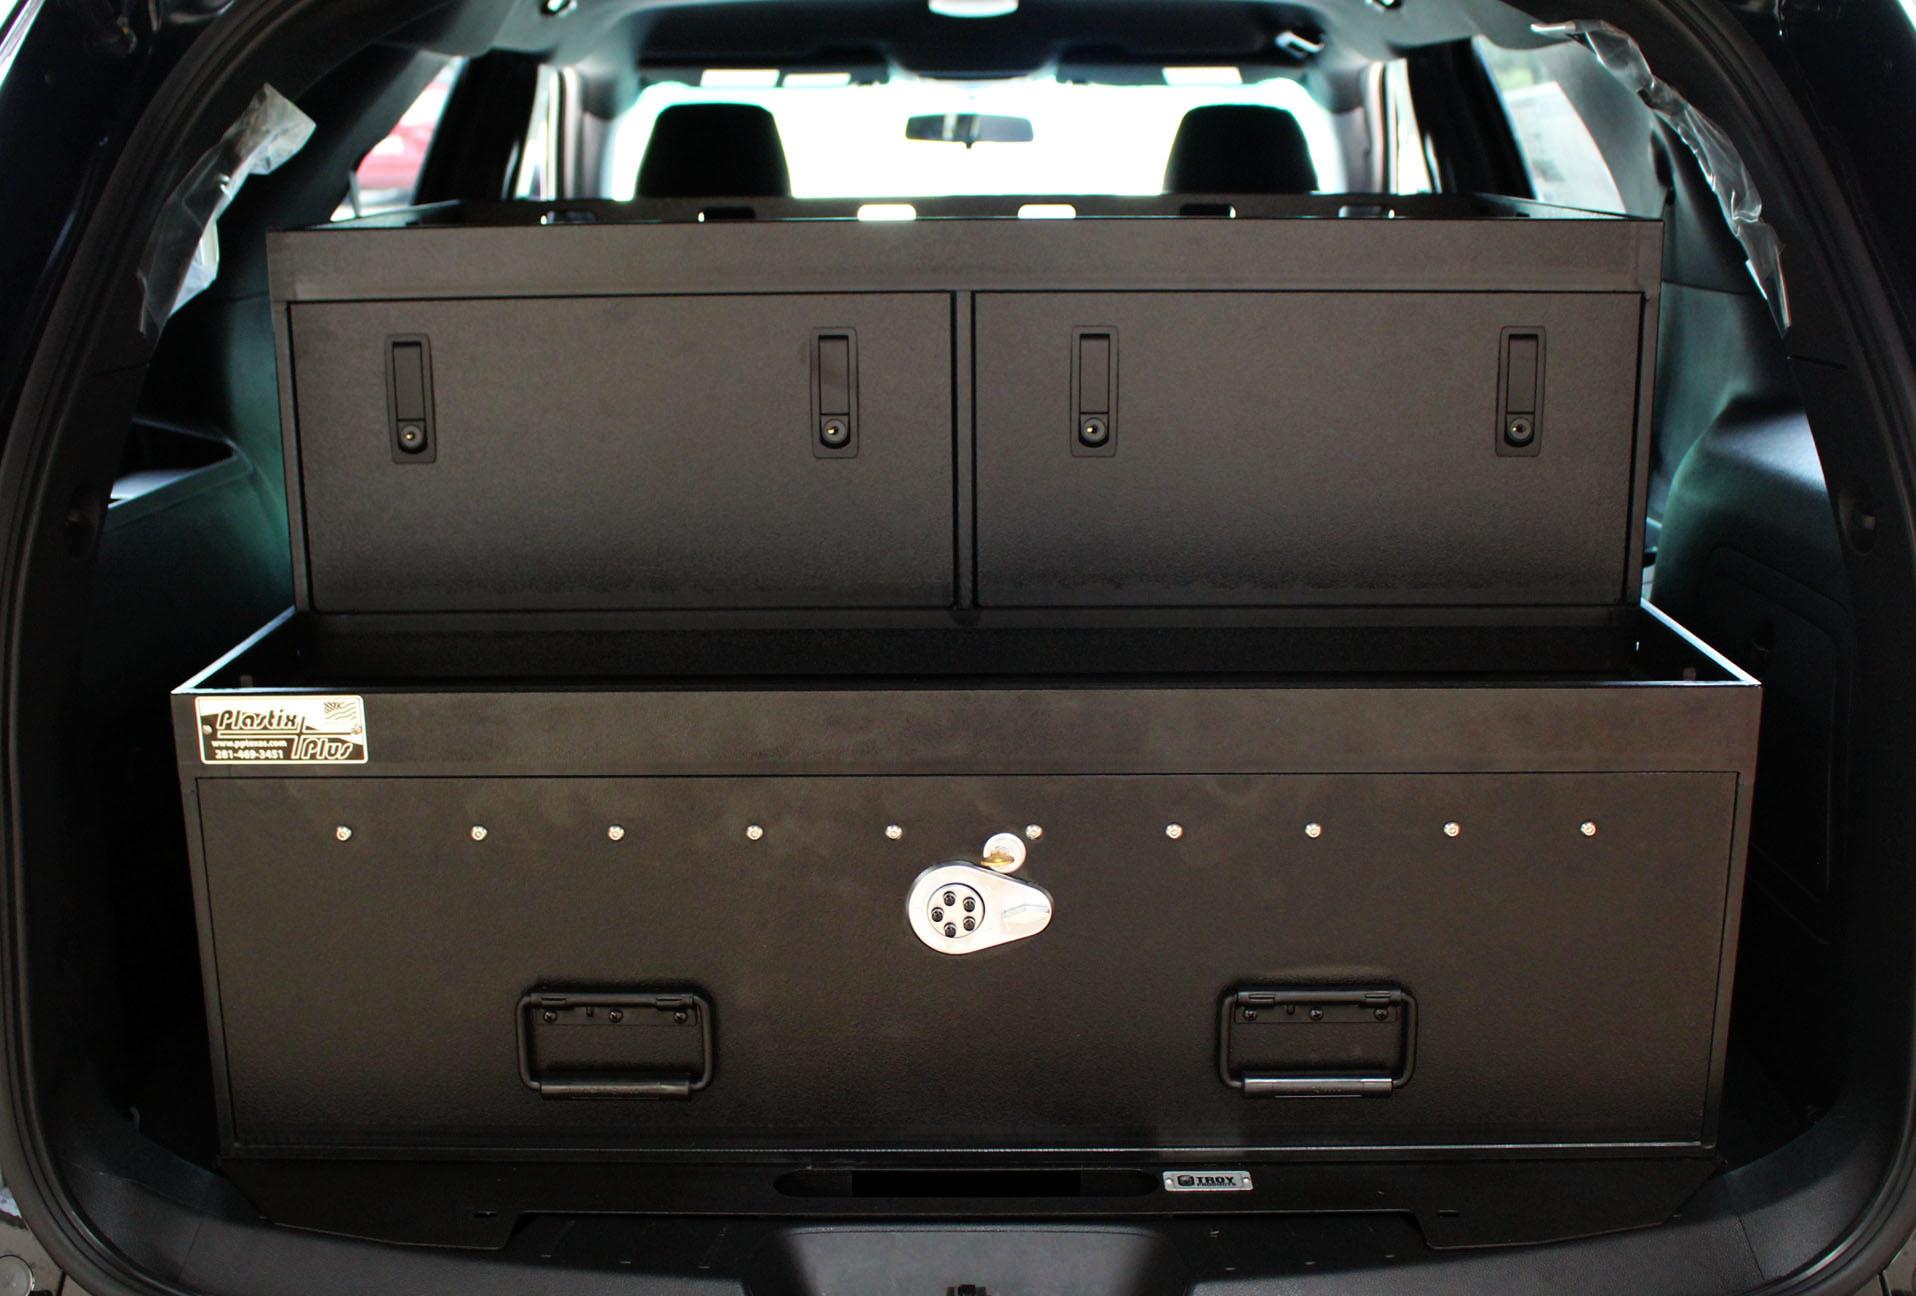 Ford Interceptor SUV Option Drawers